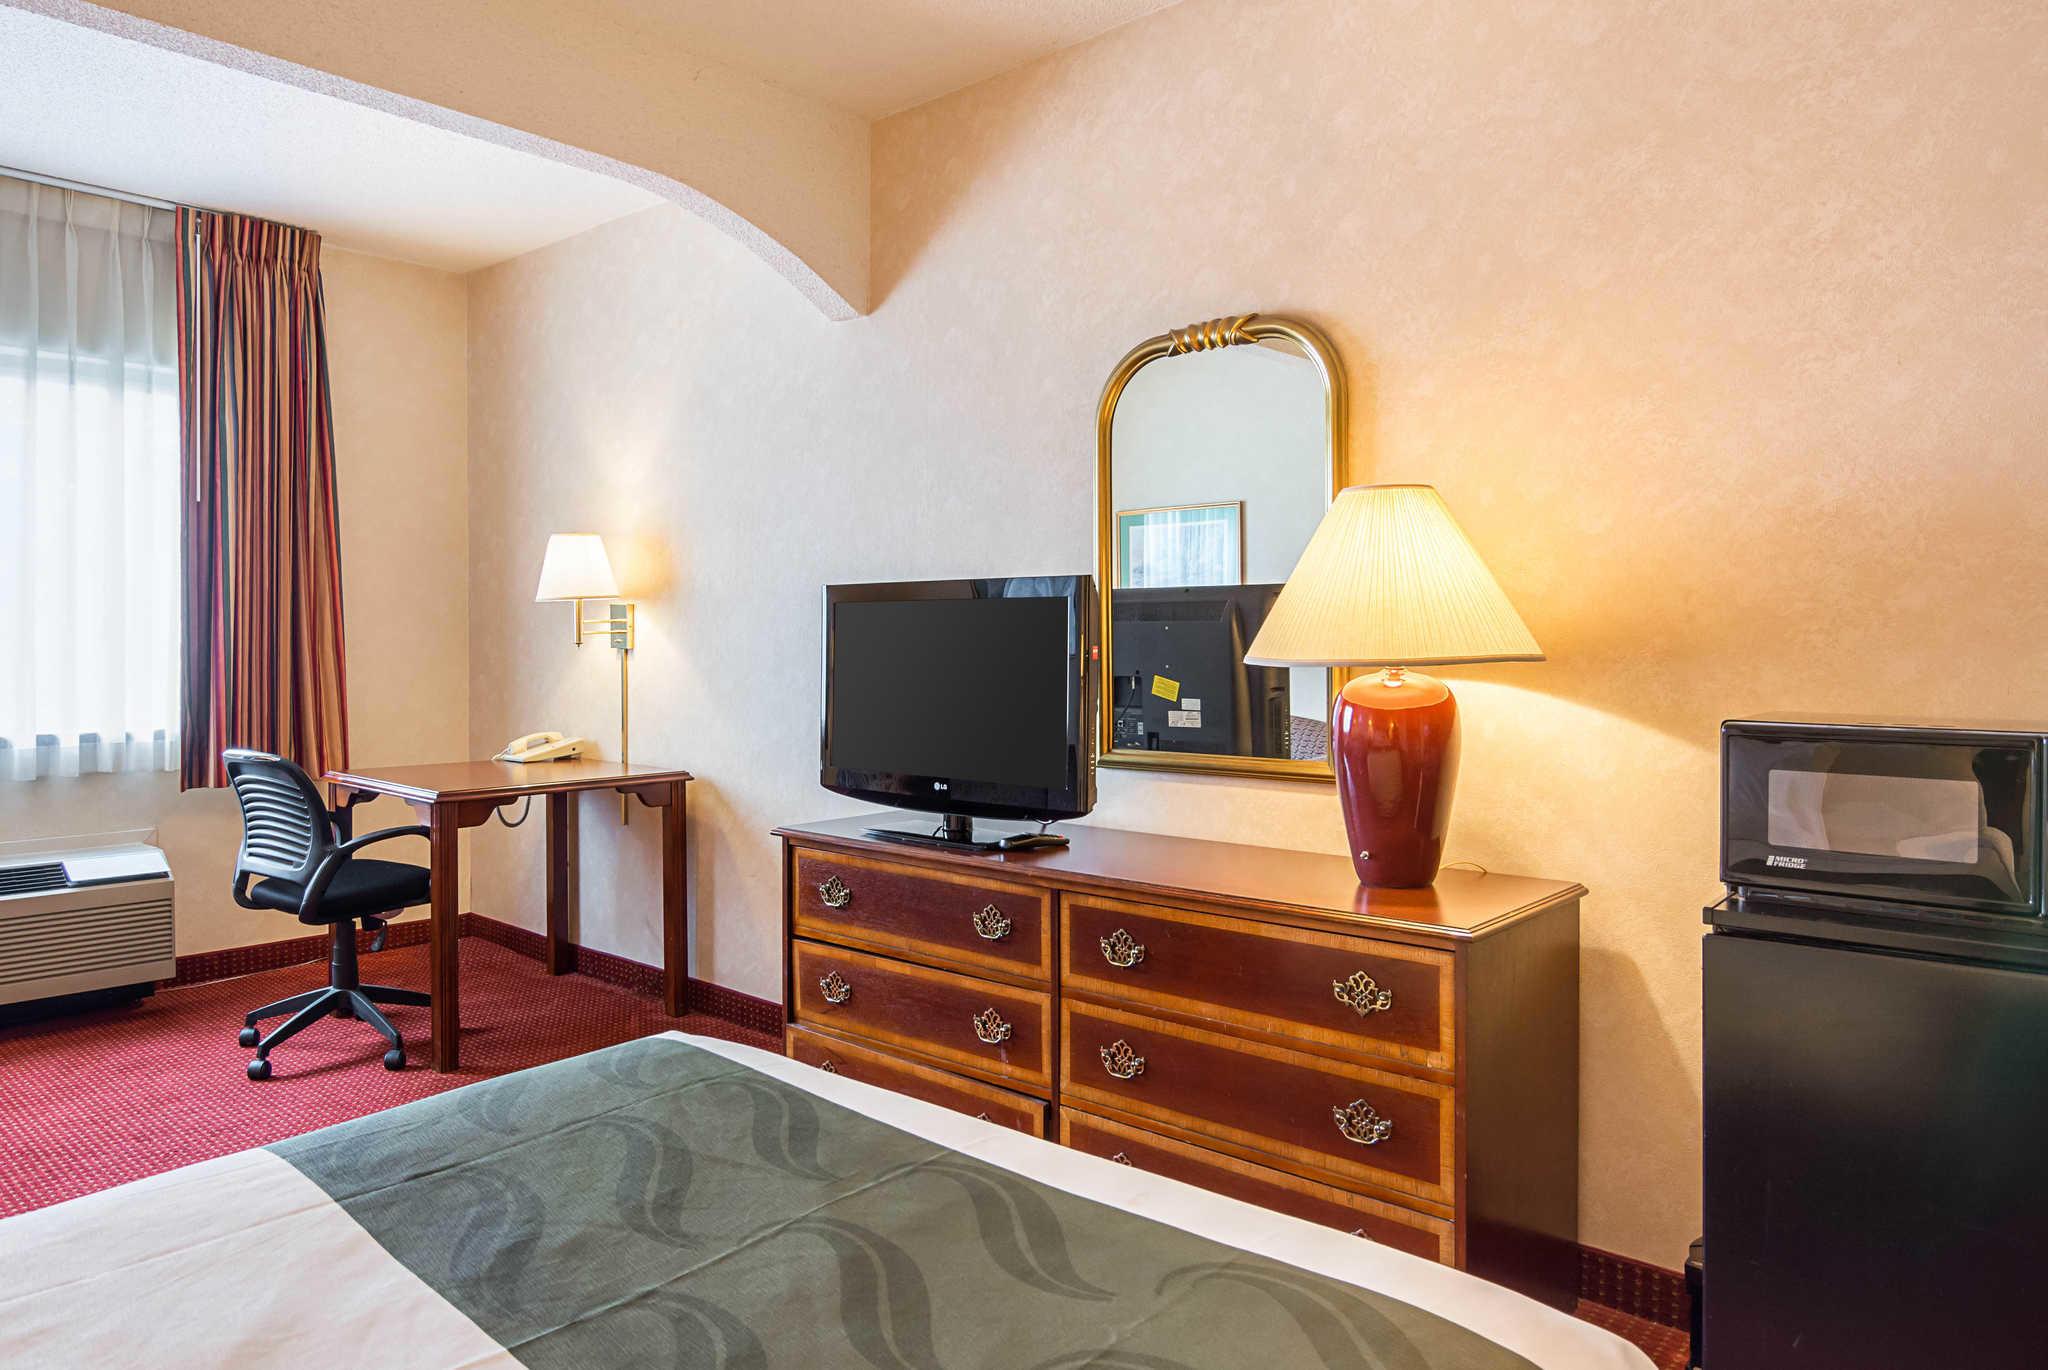 Quality Inn & Suites Kearneysville - Martinsburg image 12